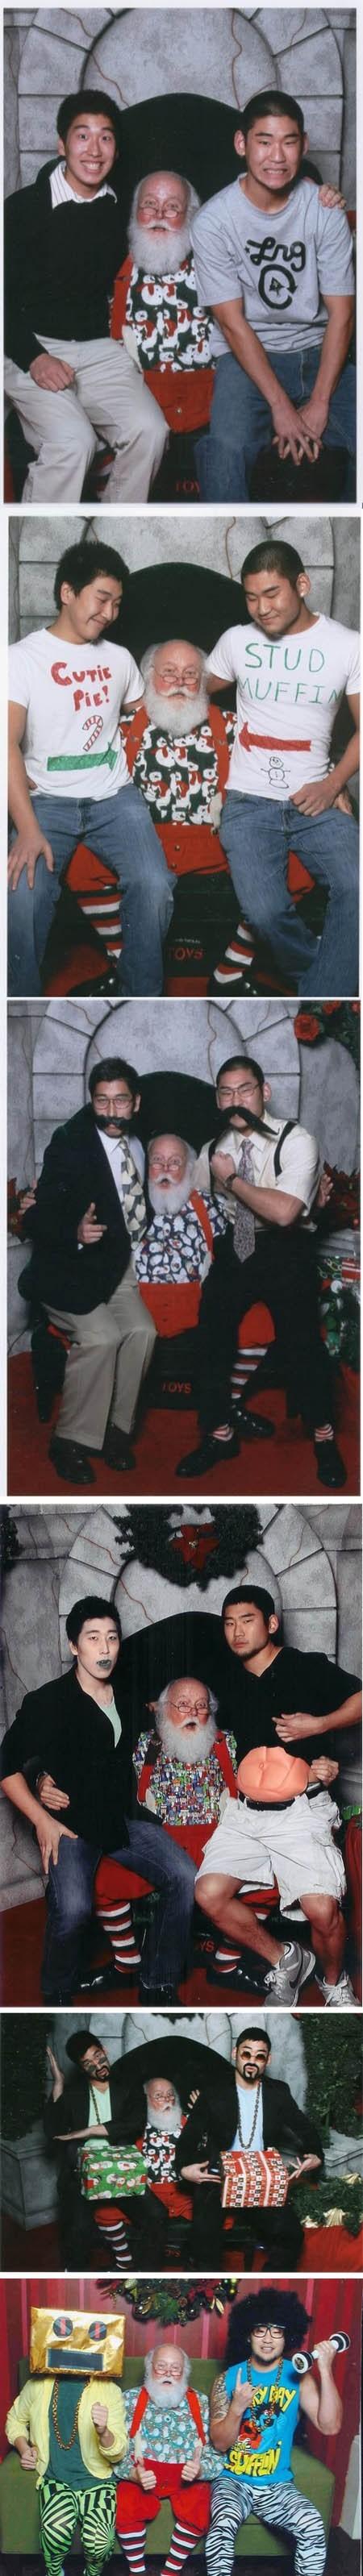 Photos With Santa: Expert Level!